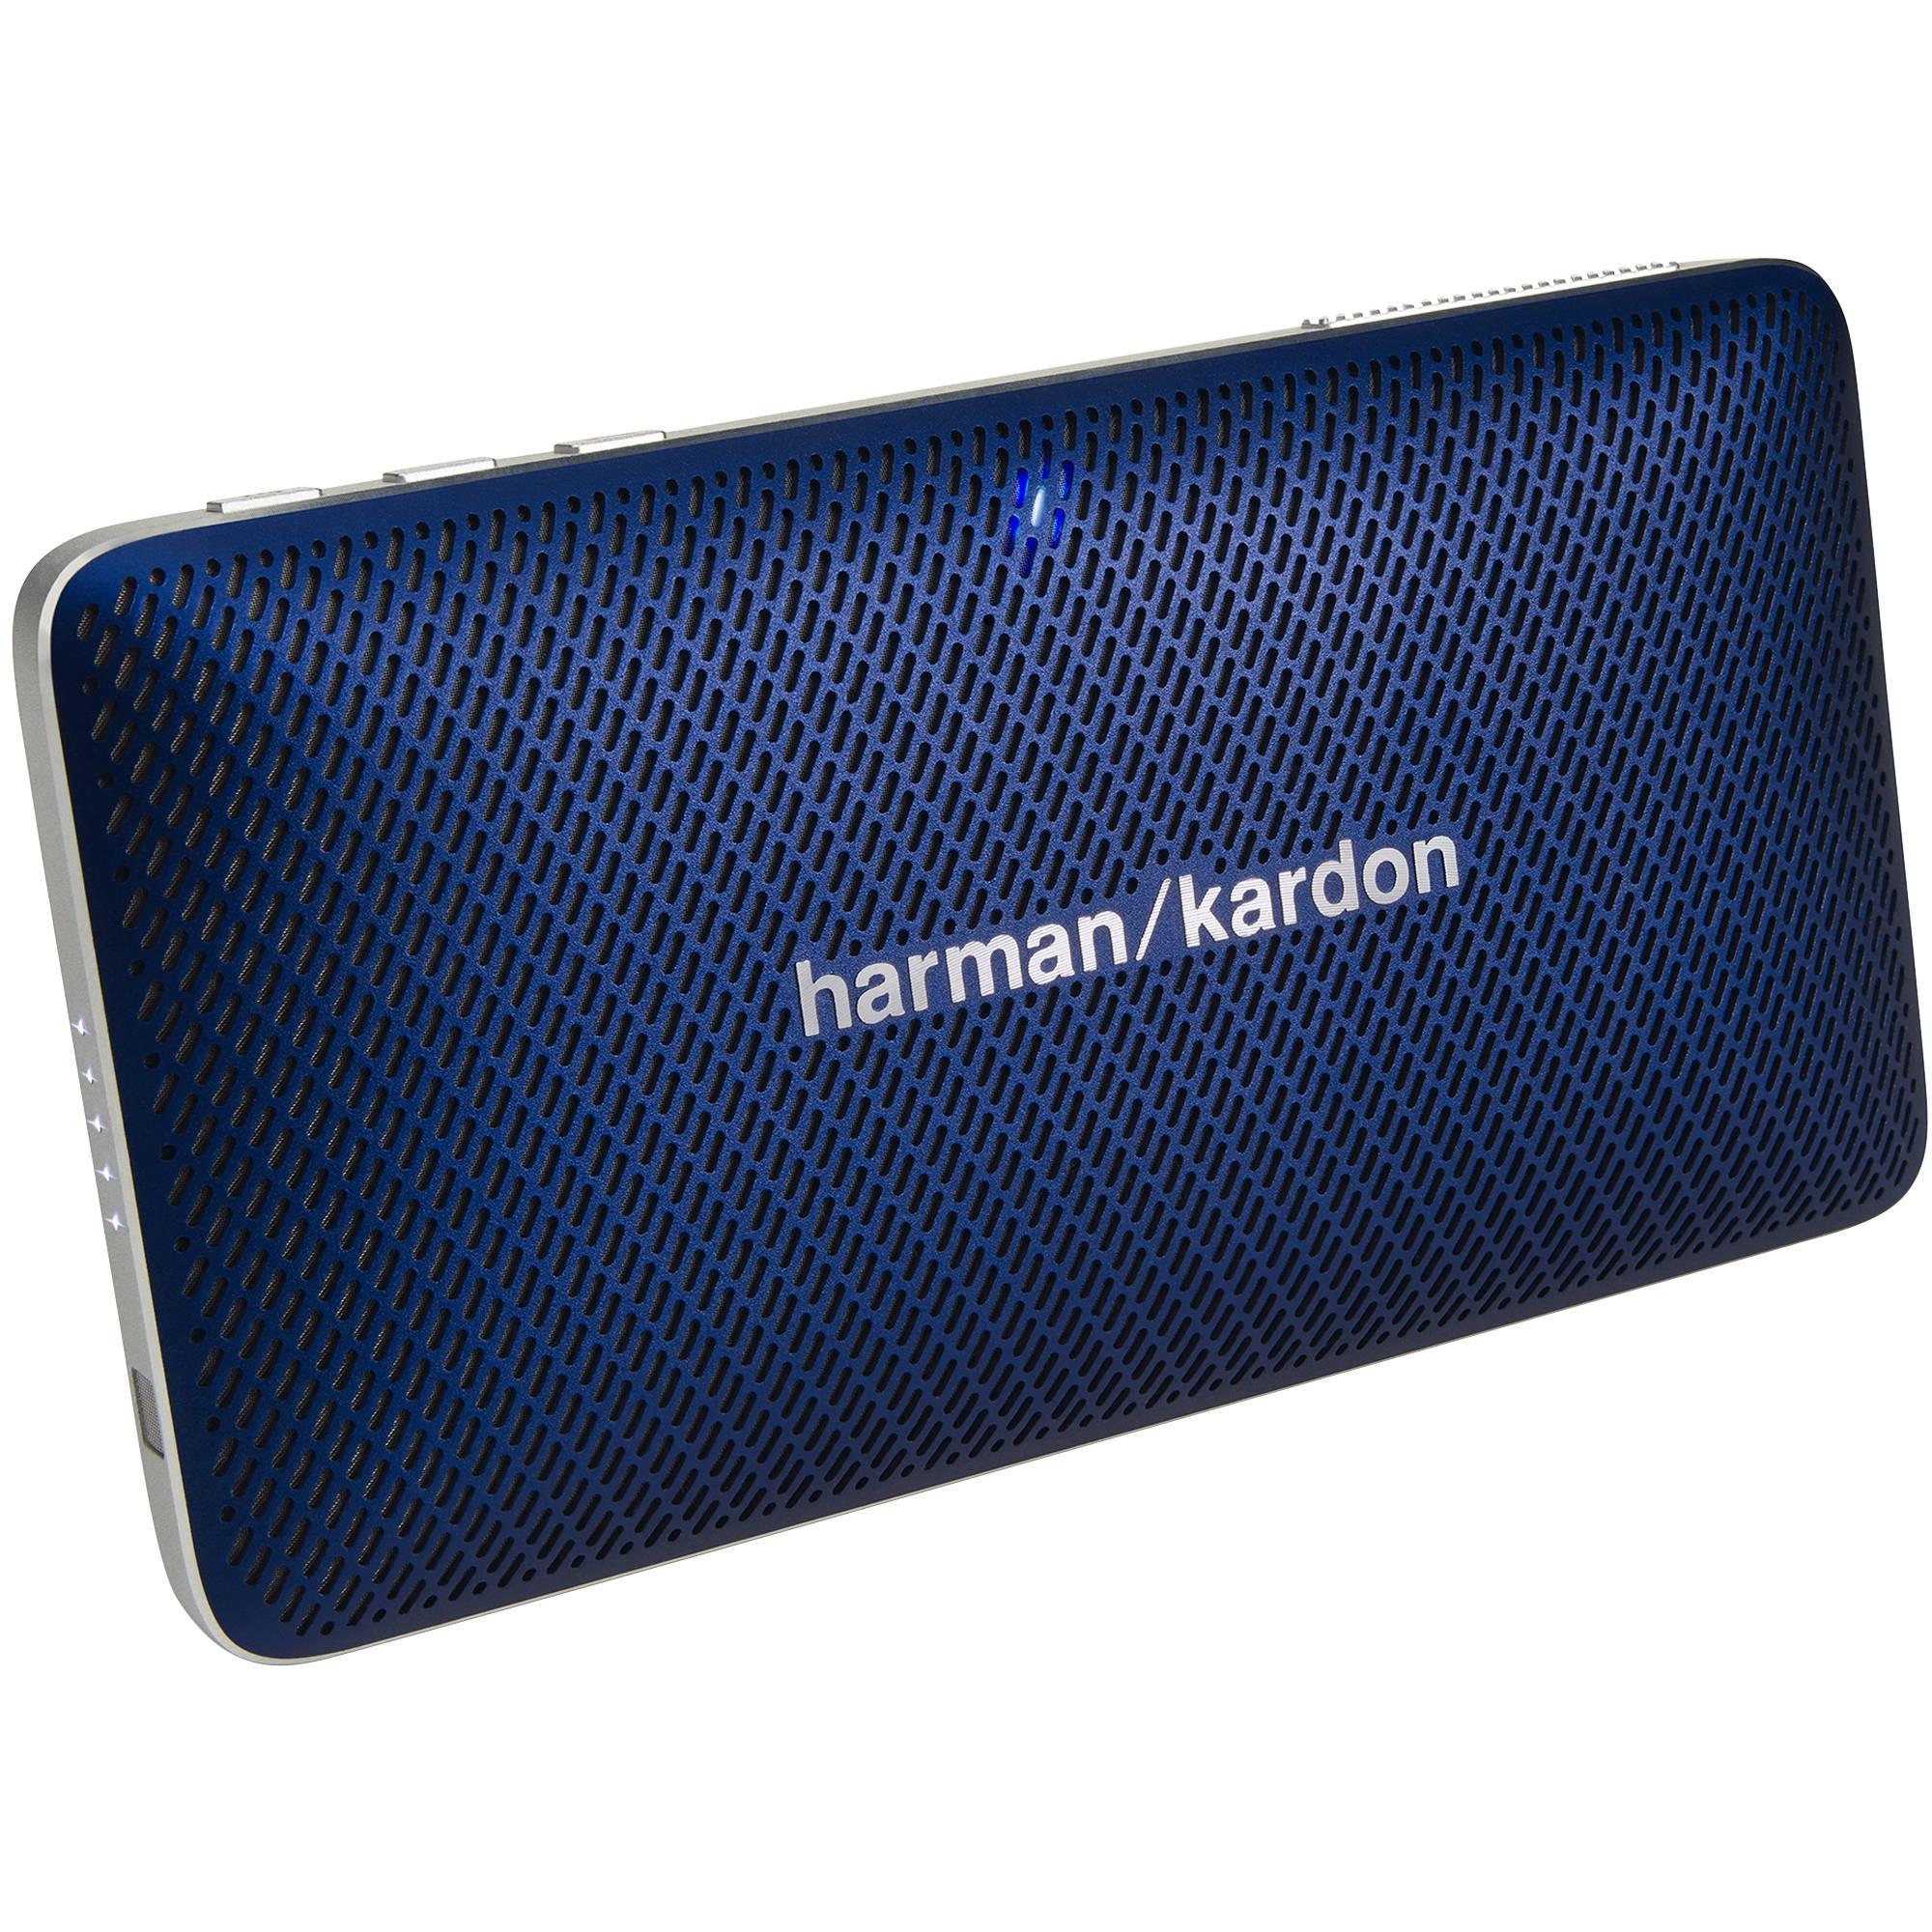 Портативная акустика Harman/Kardon Esquire Mini Blue (HKESQUIREMINIBLUE) синий